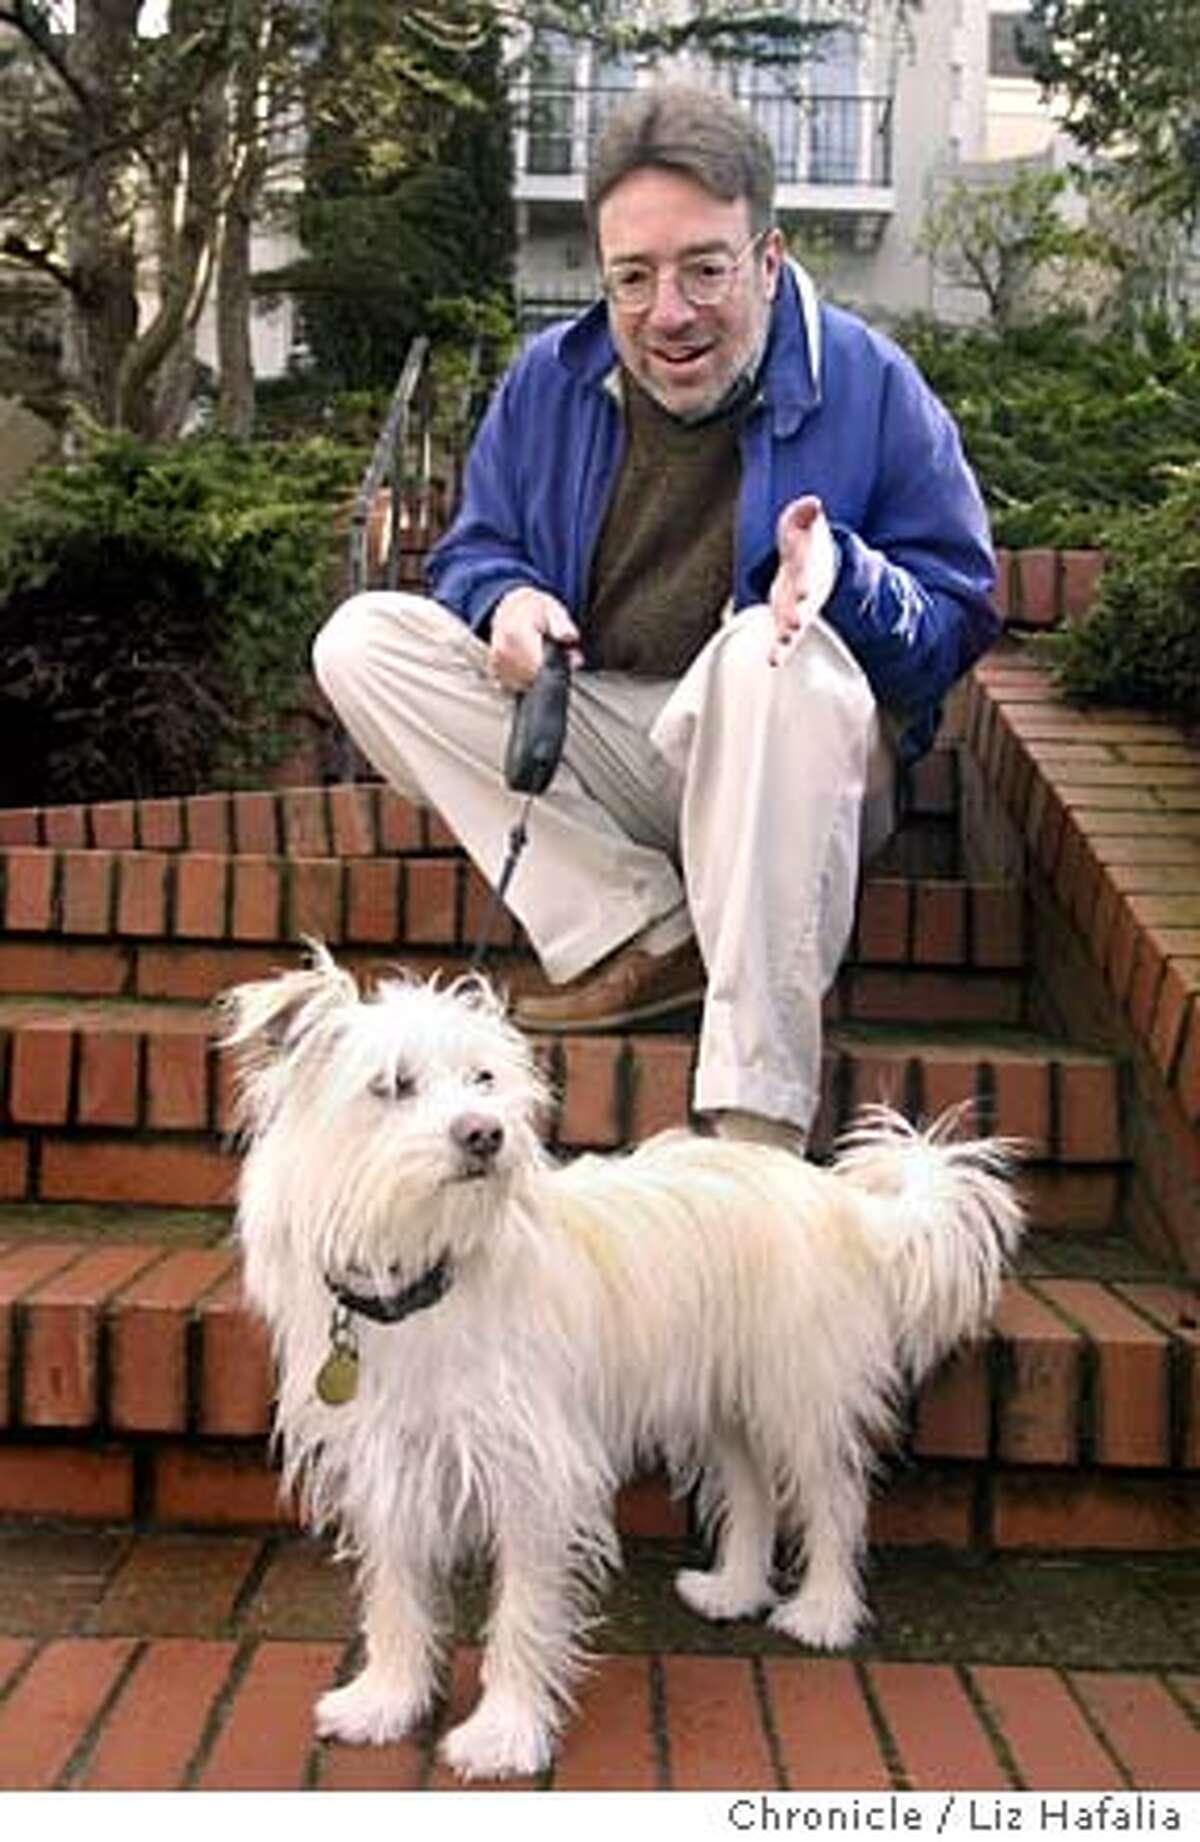 Steven Winn talking with the family dog, Como, during his walk. Shot on 2/4/04 in San Francisco. LIZ HAFALIA / The Chronicle